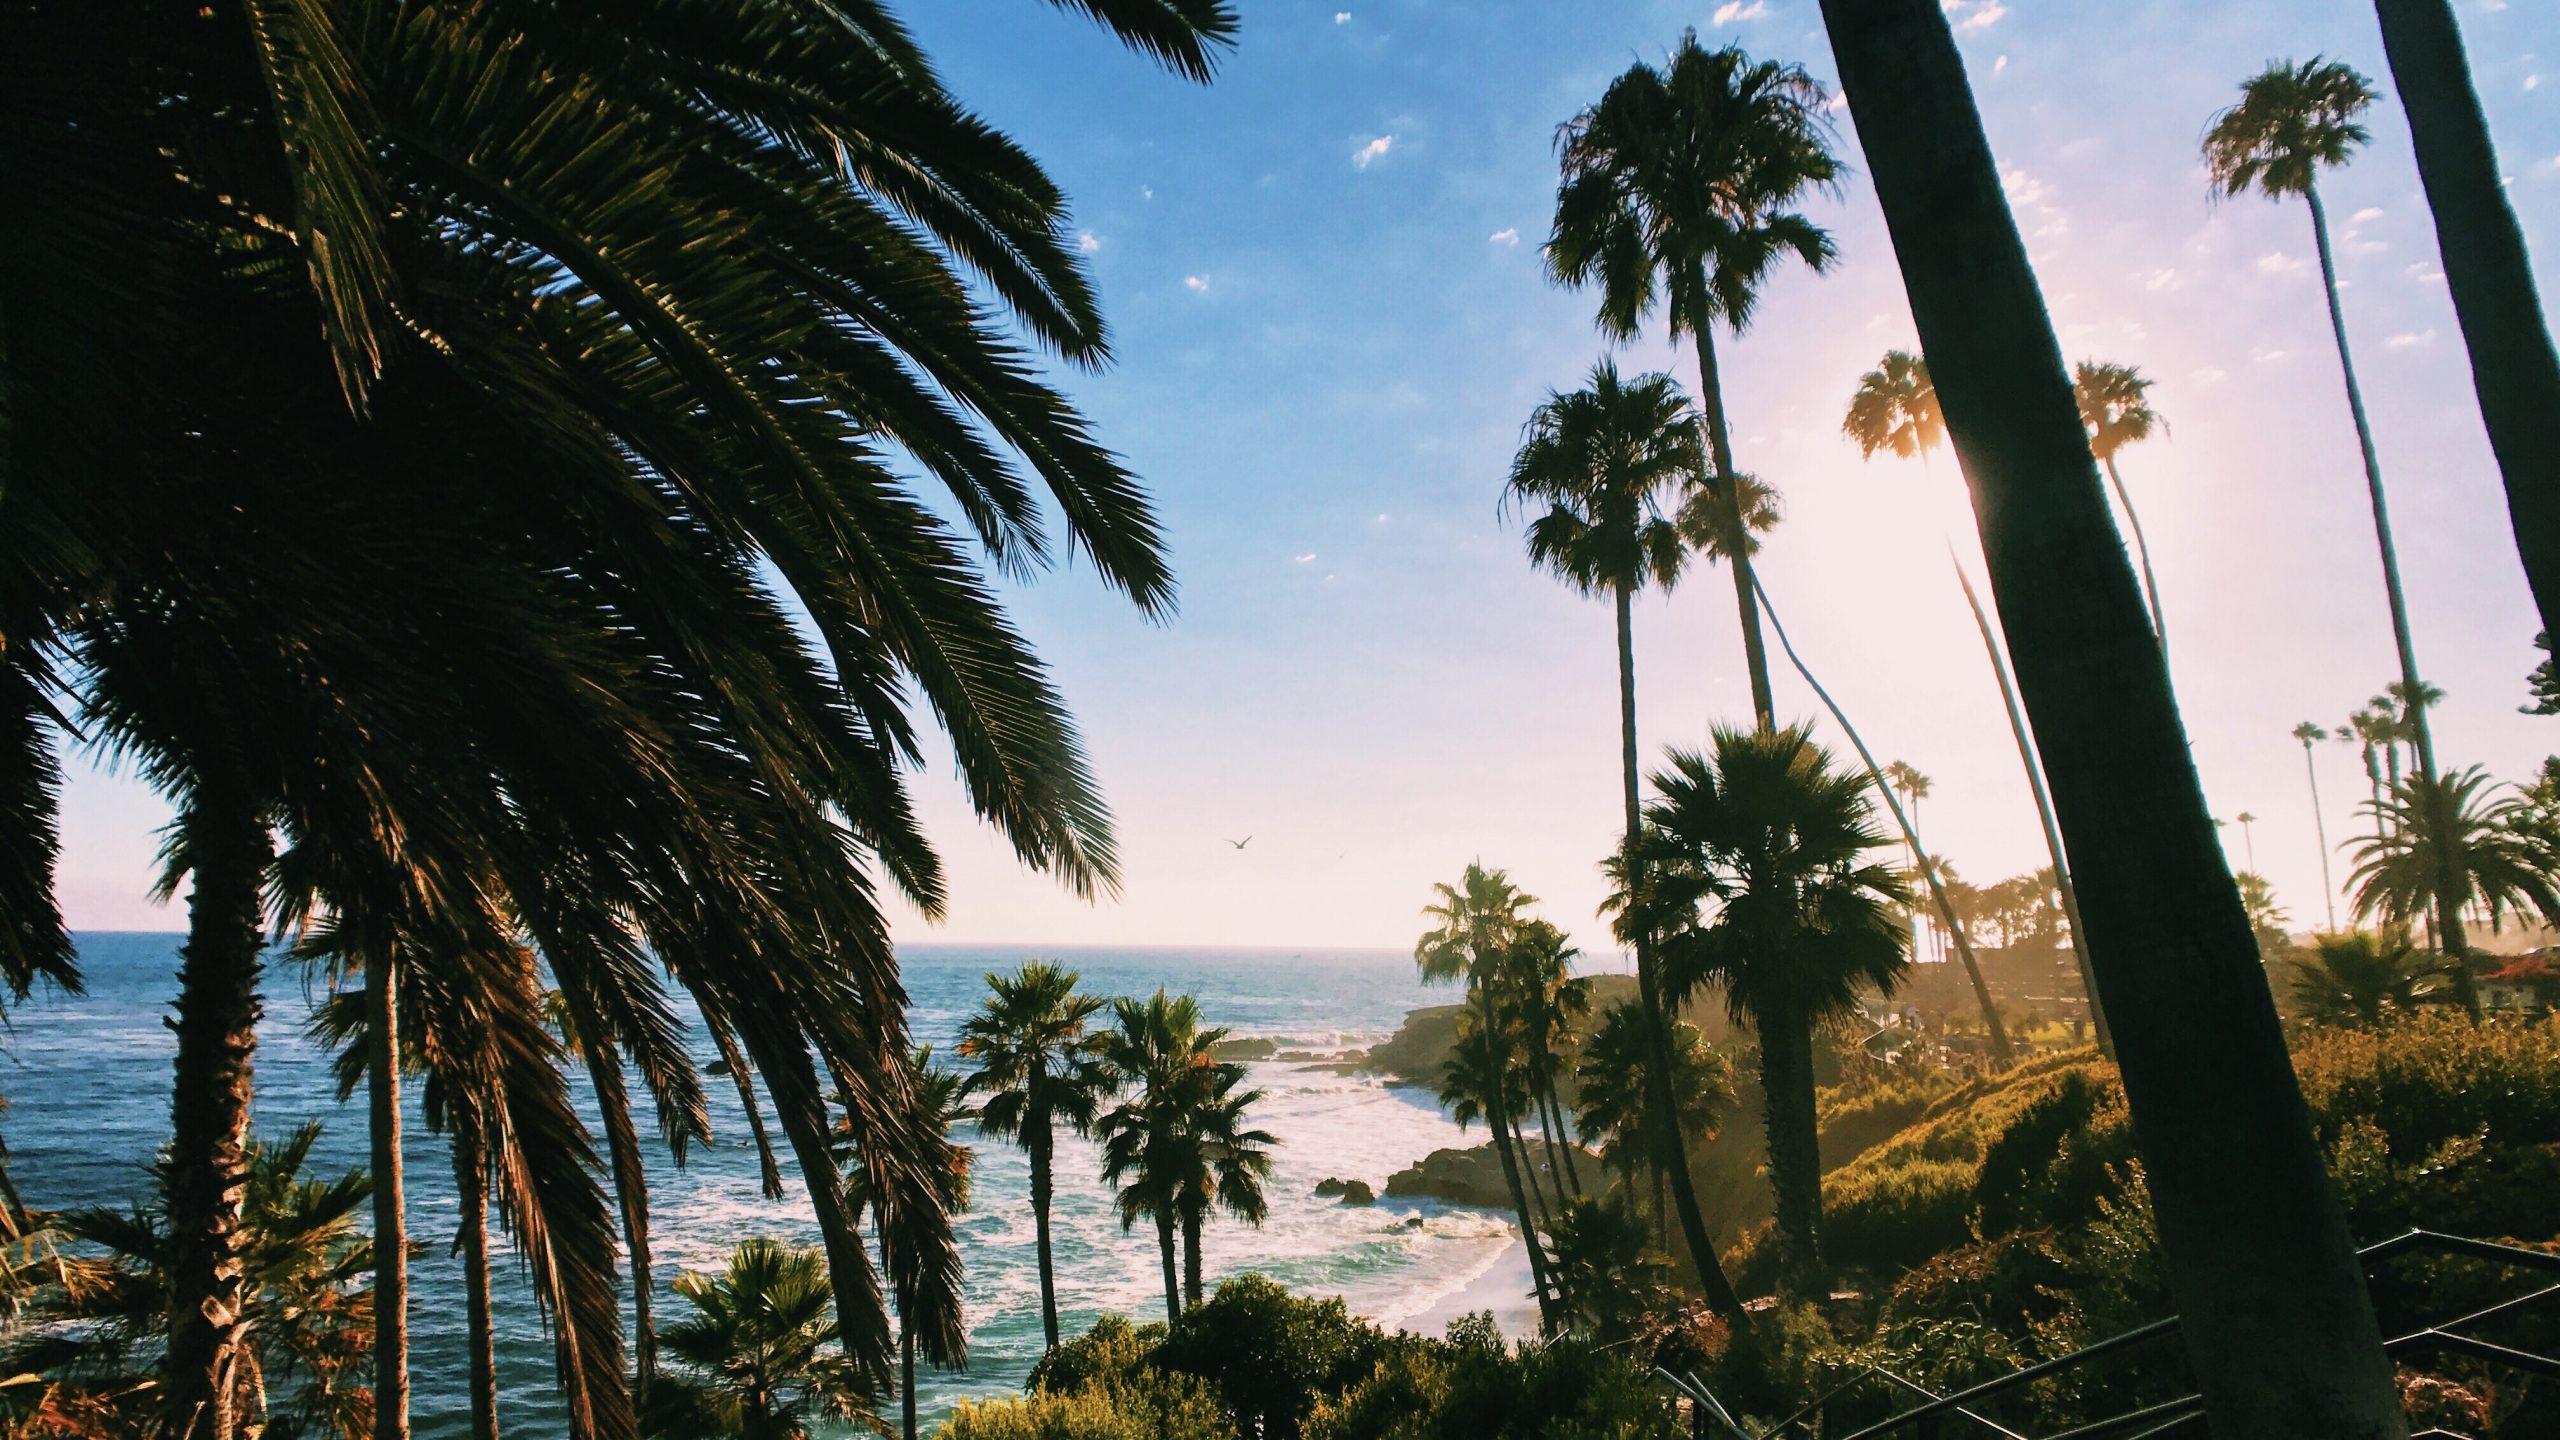 California Conditional Use Permit